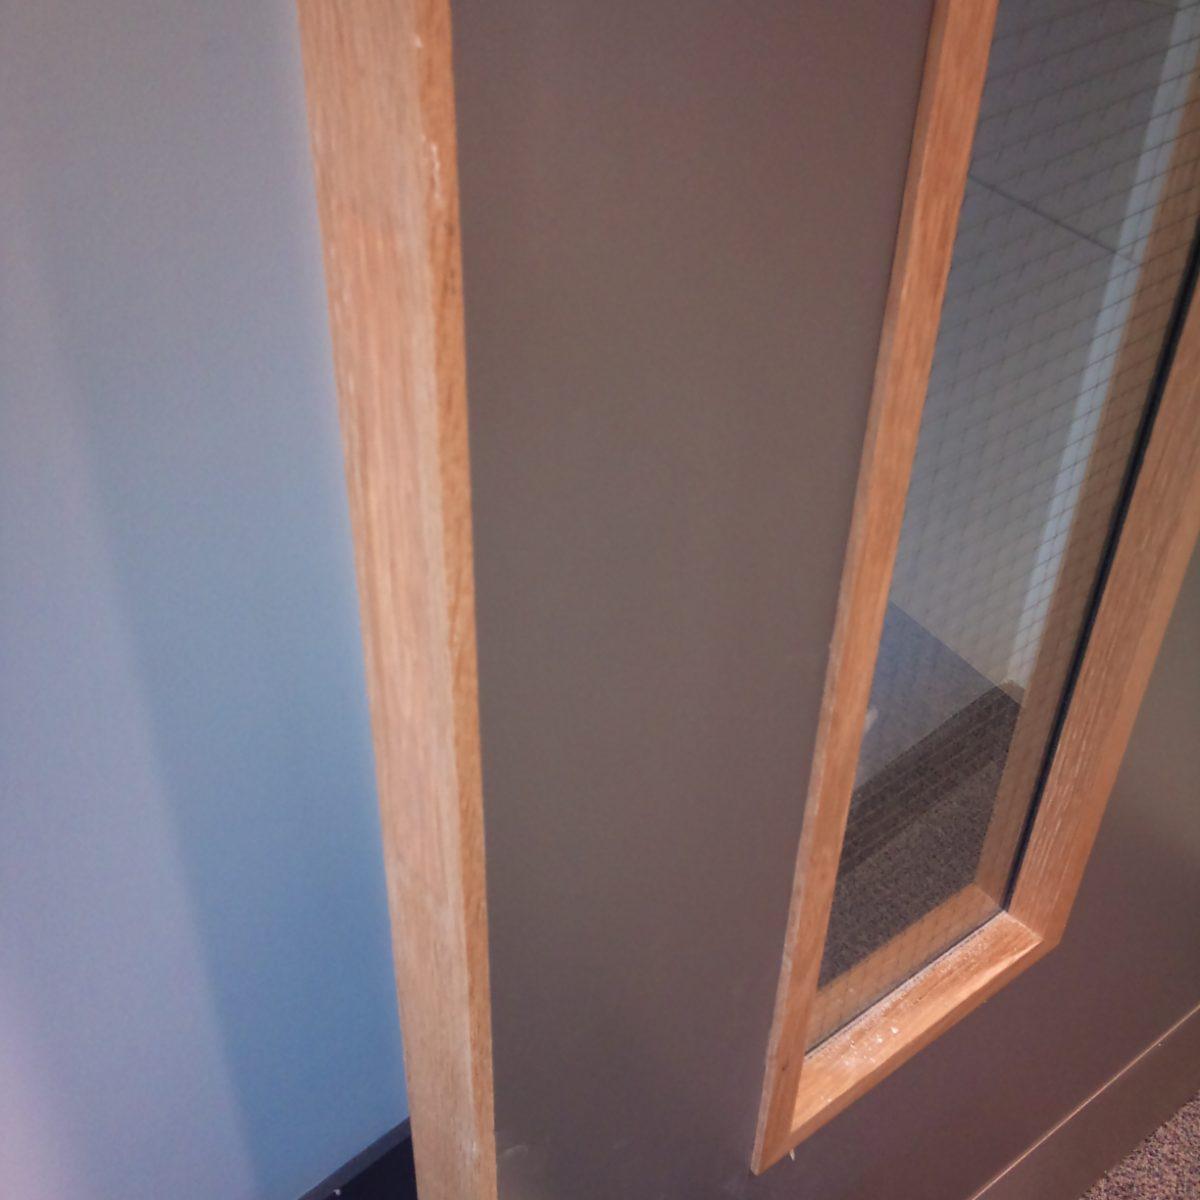 laminated door repairs